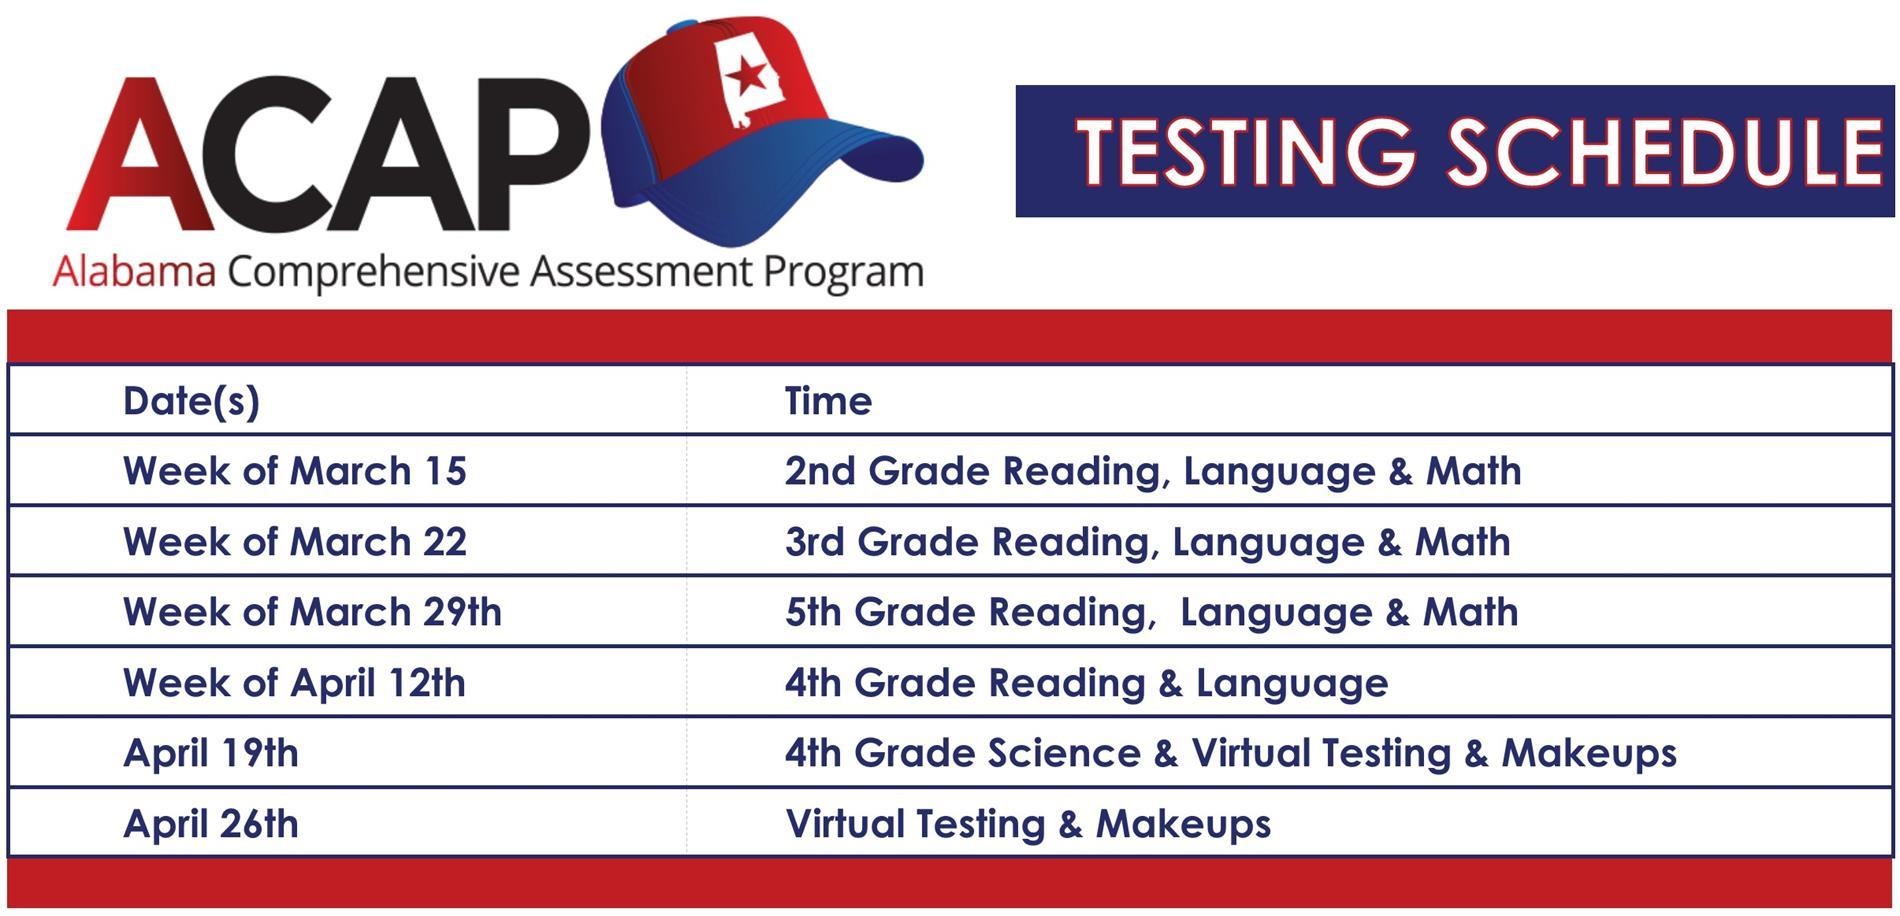 ACAP Testing Schedule